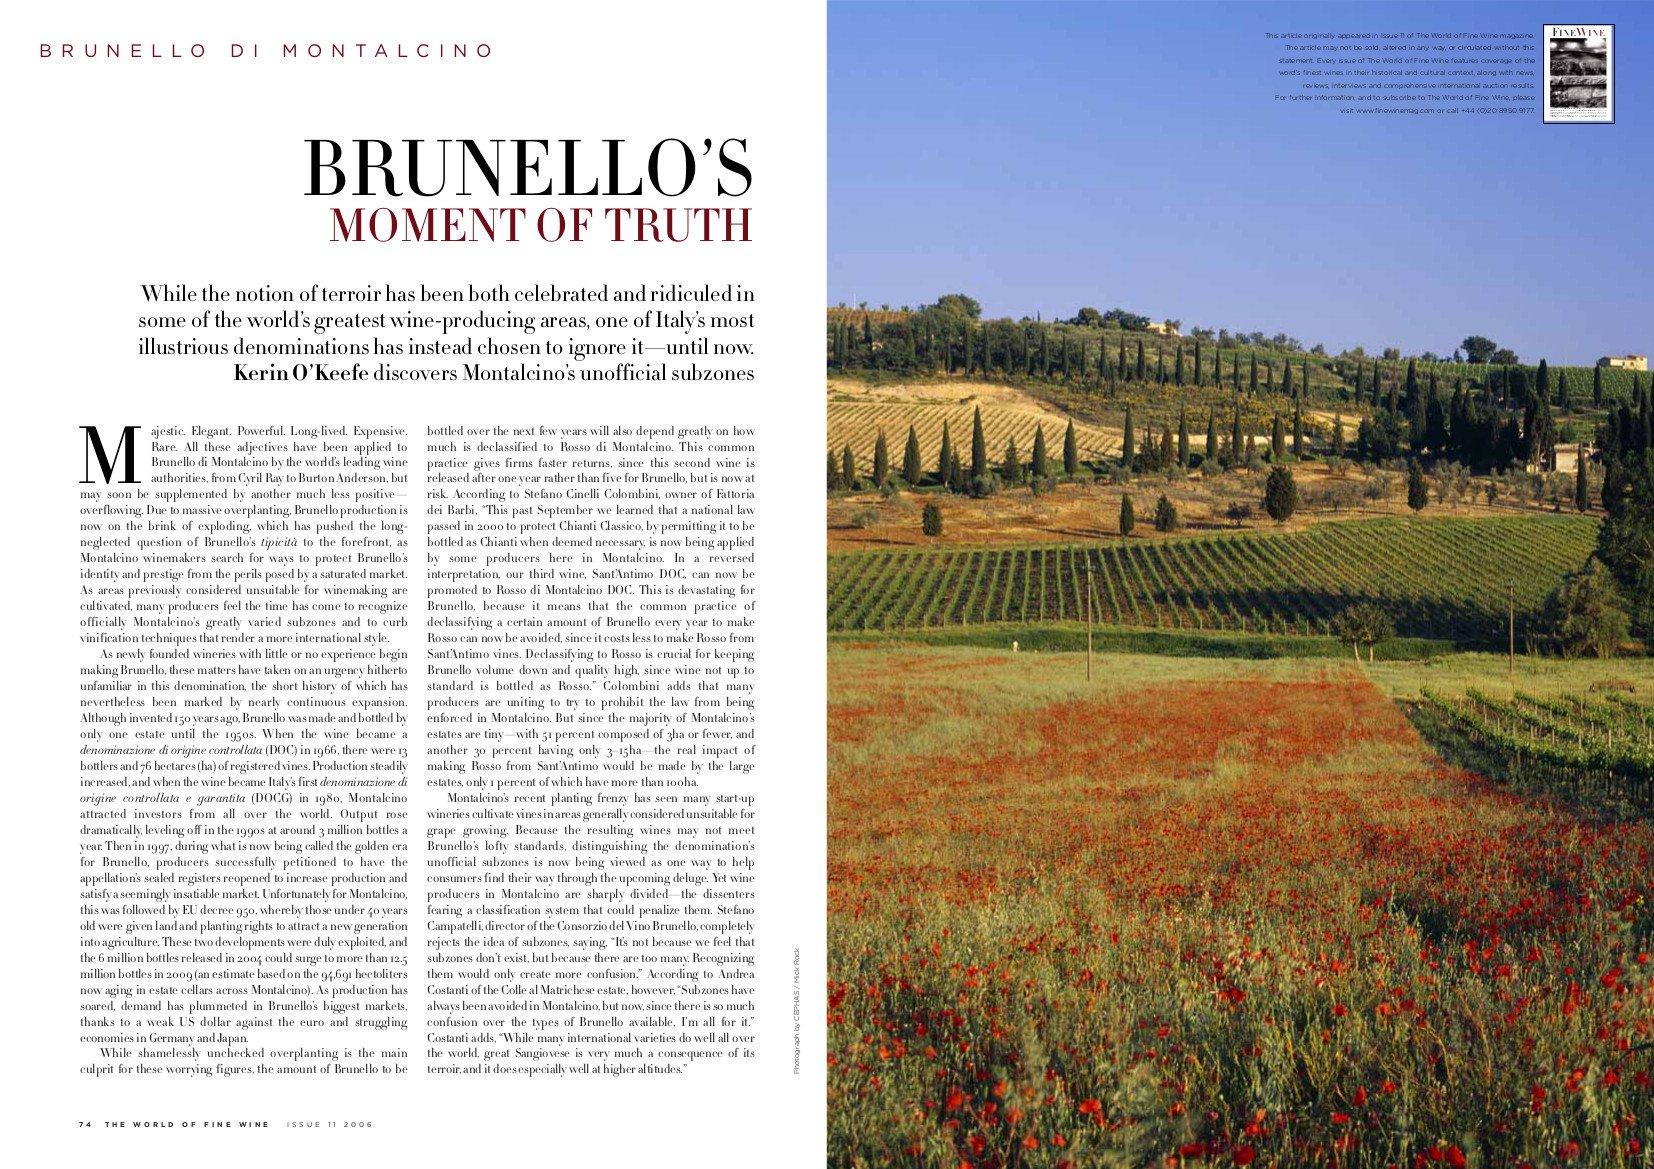 Brunello's Moment of Truth